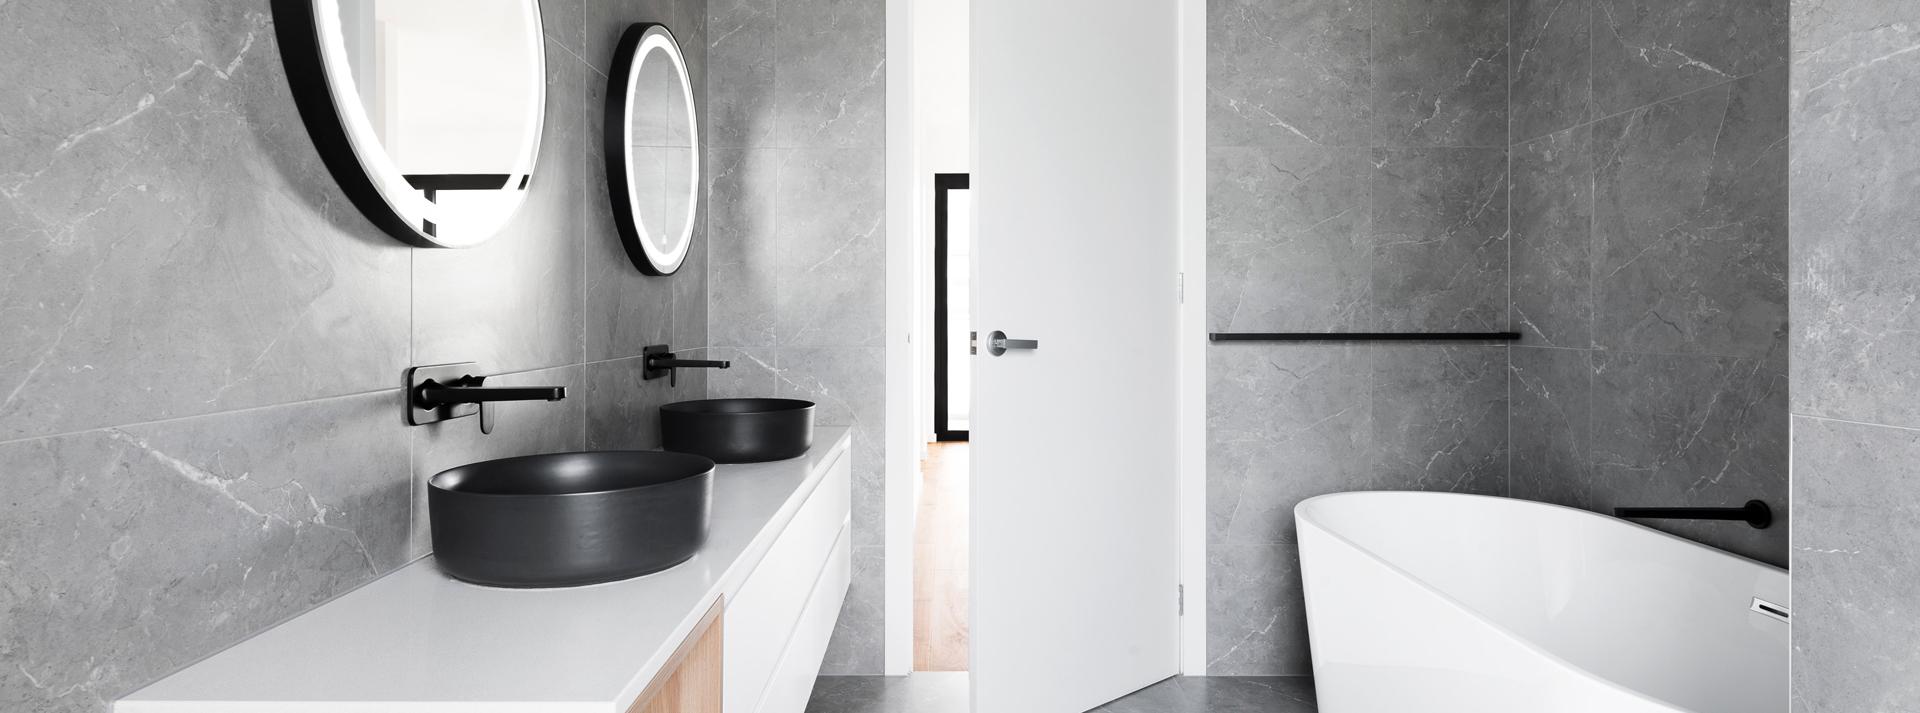 Why should I estimate my bathroom remodel?